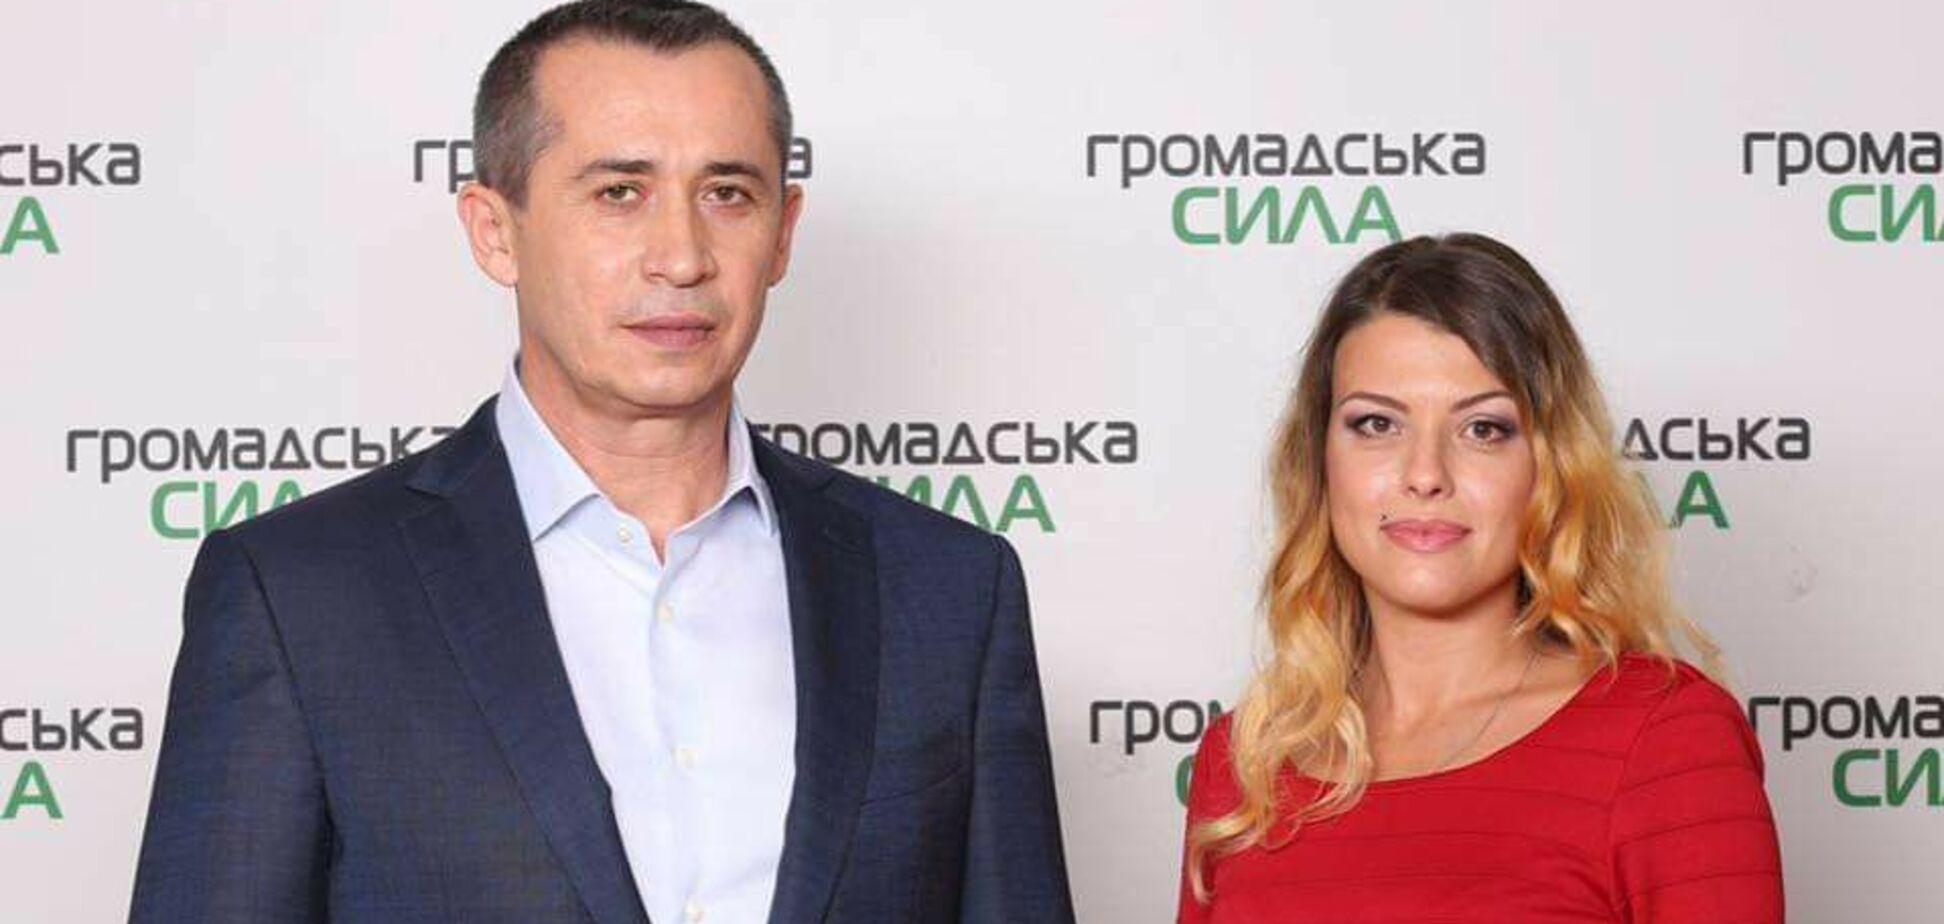 Команда Загида Краснова попала в громкий скандал